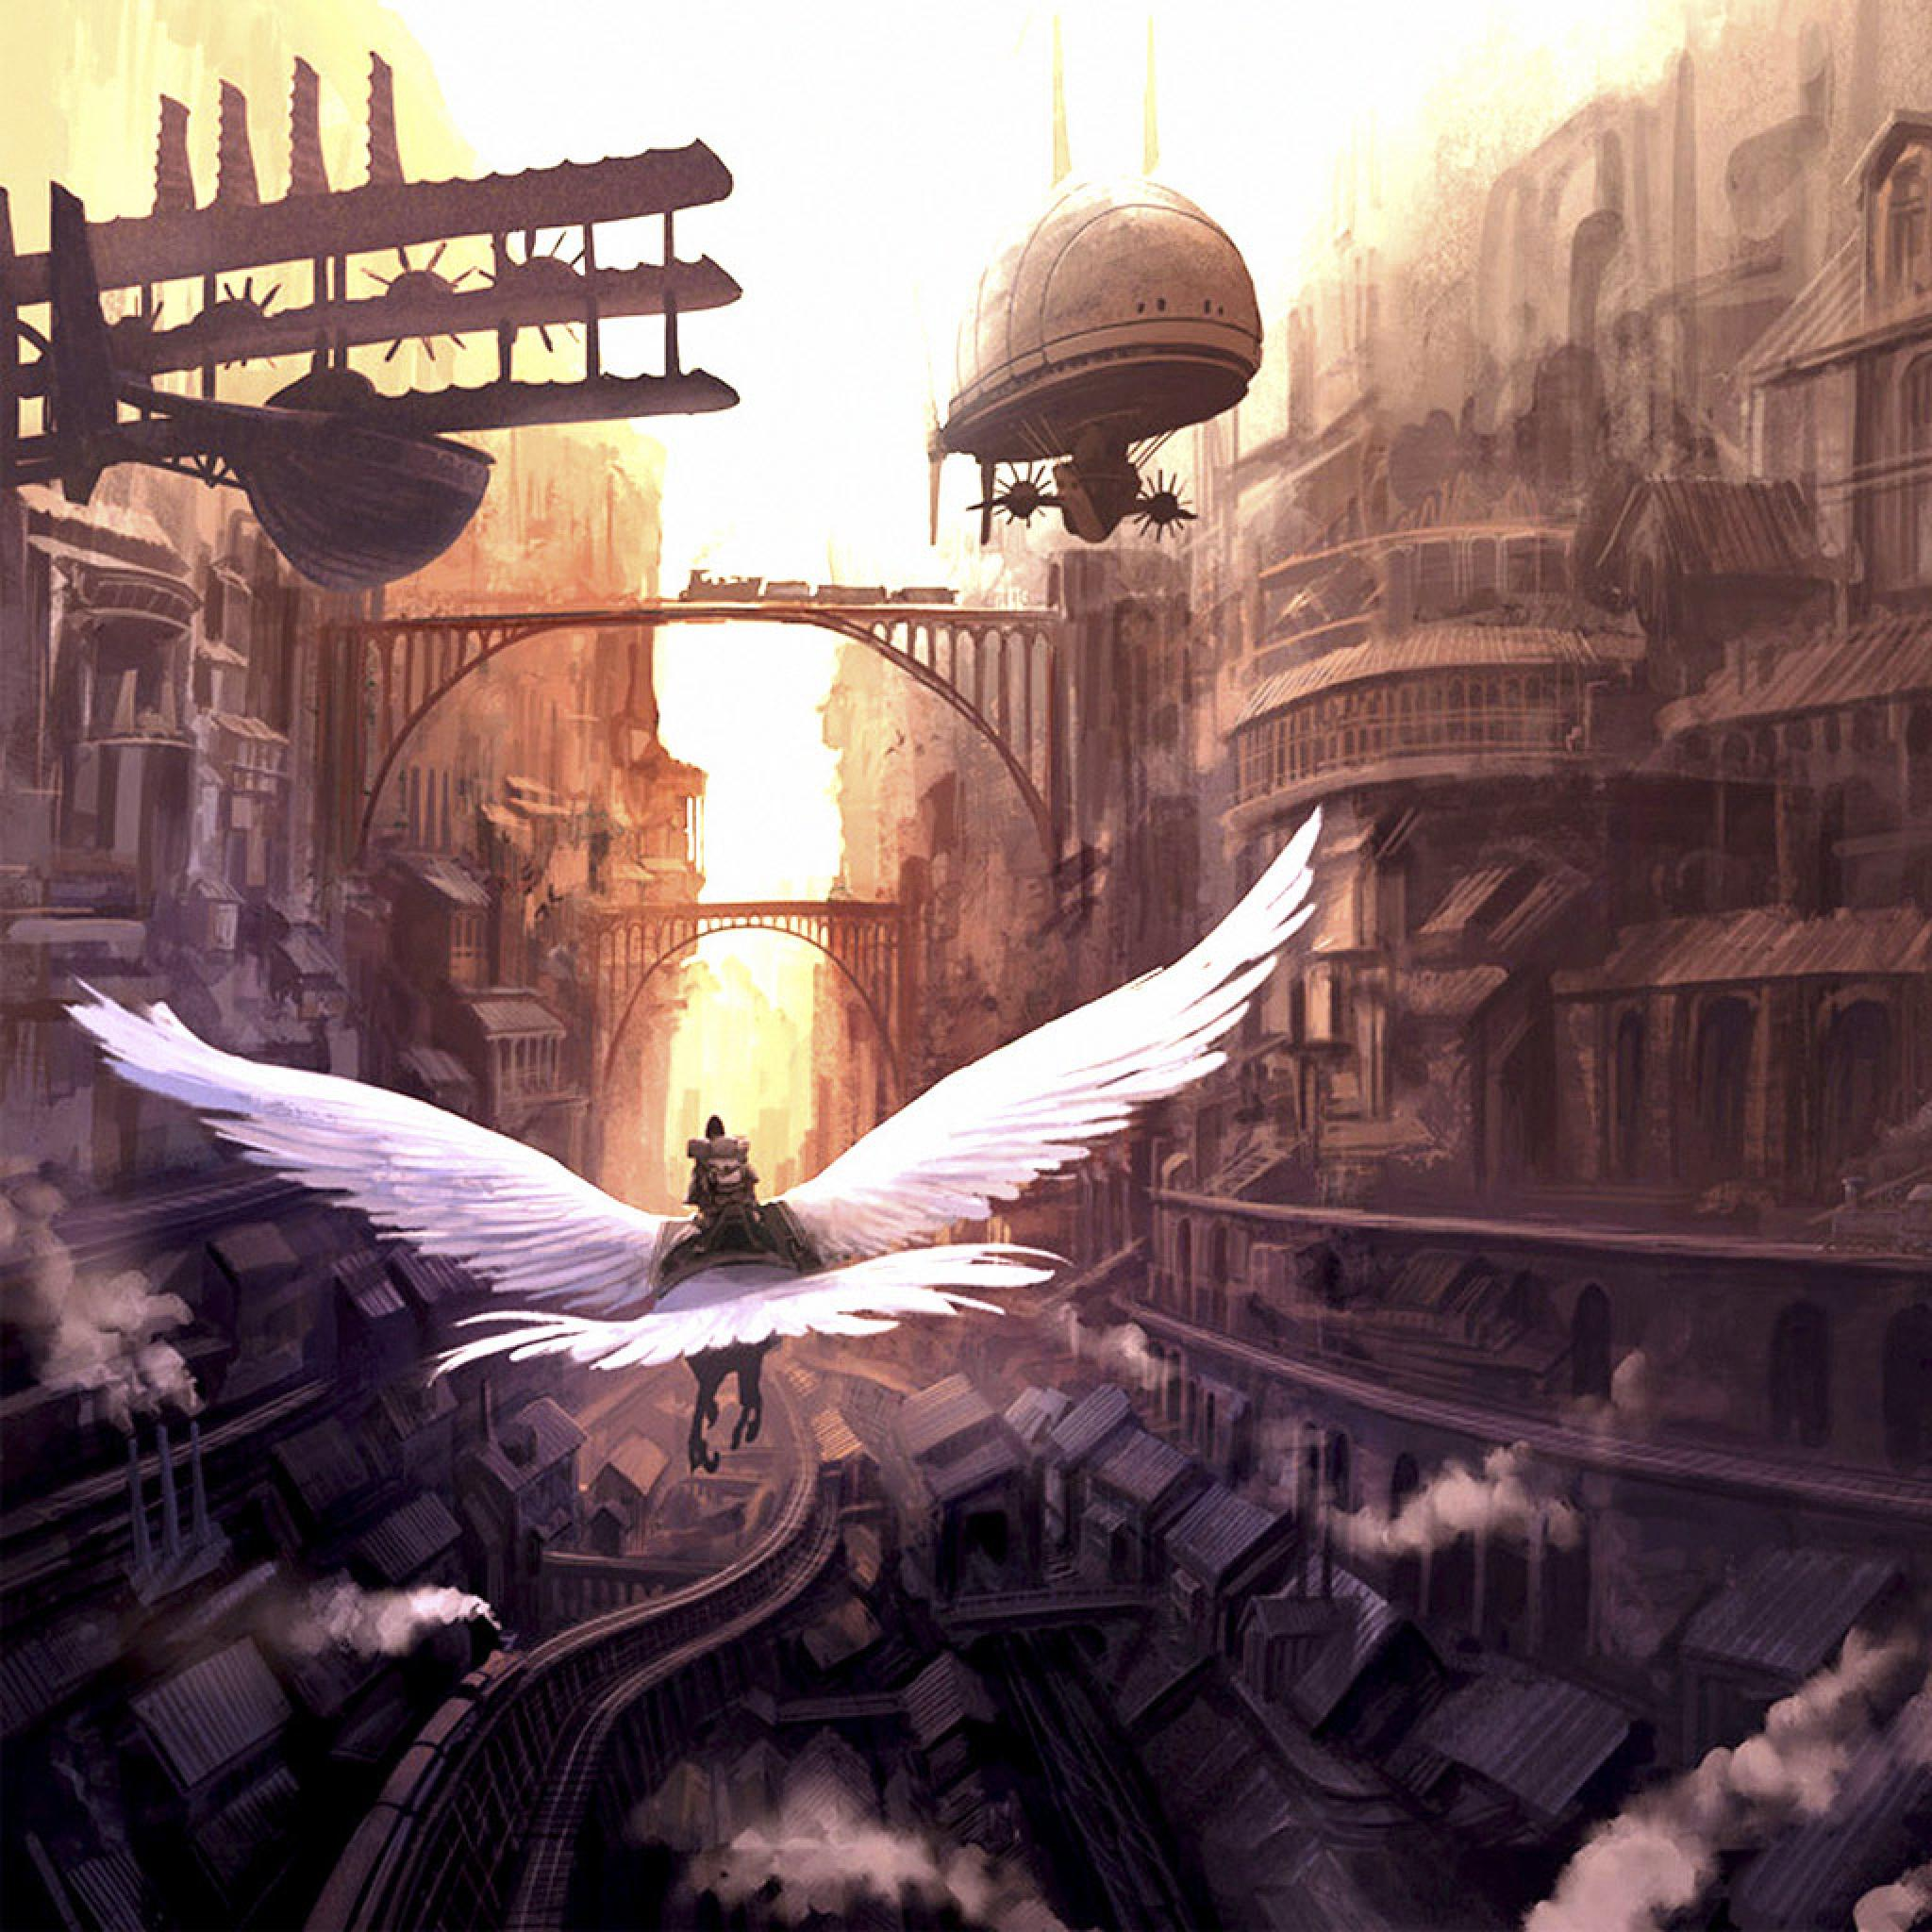 Gothic Girl Wallpaper Iphone Cg Fantasy Fantasy Bird Flying Over The City Ipad